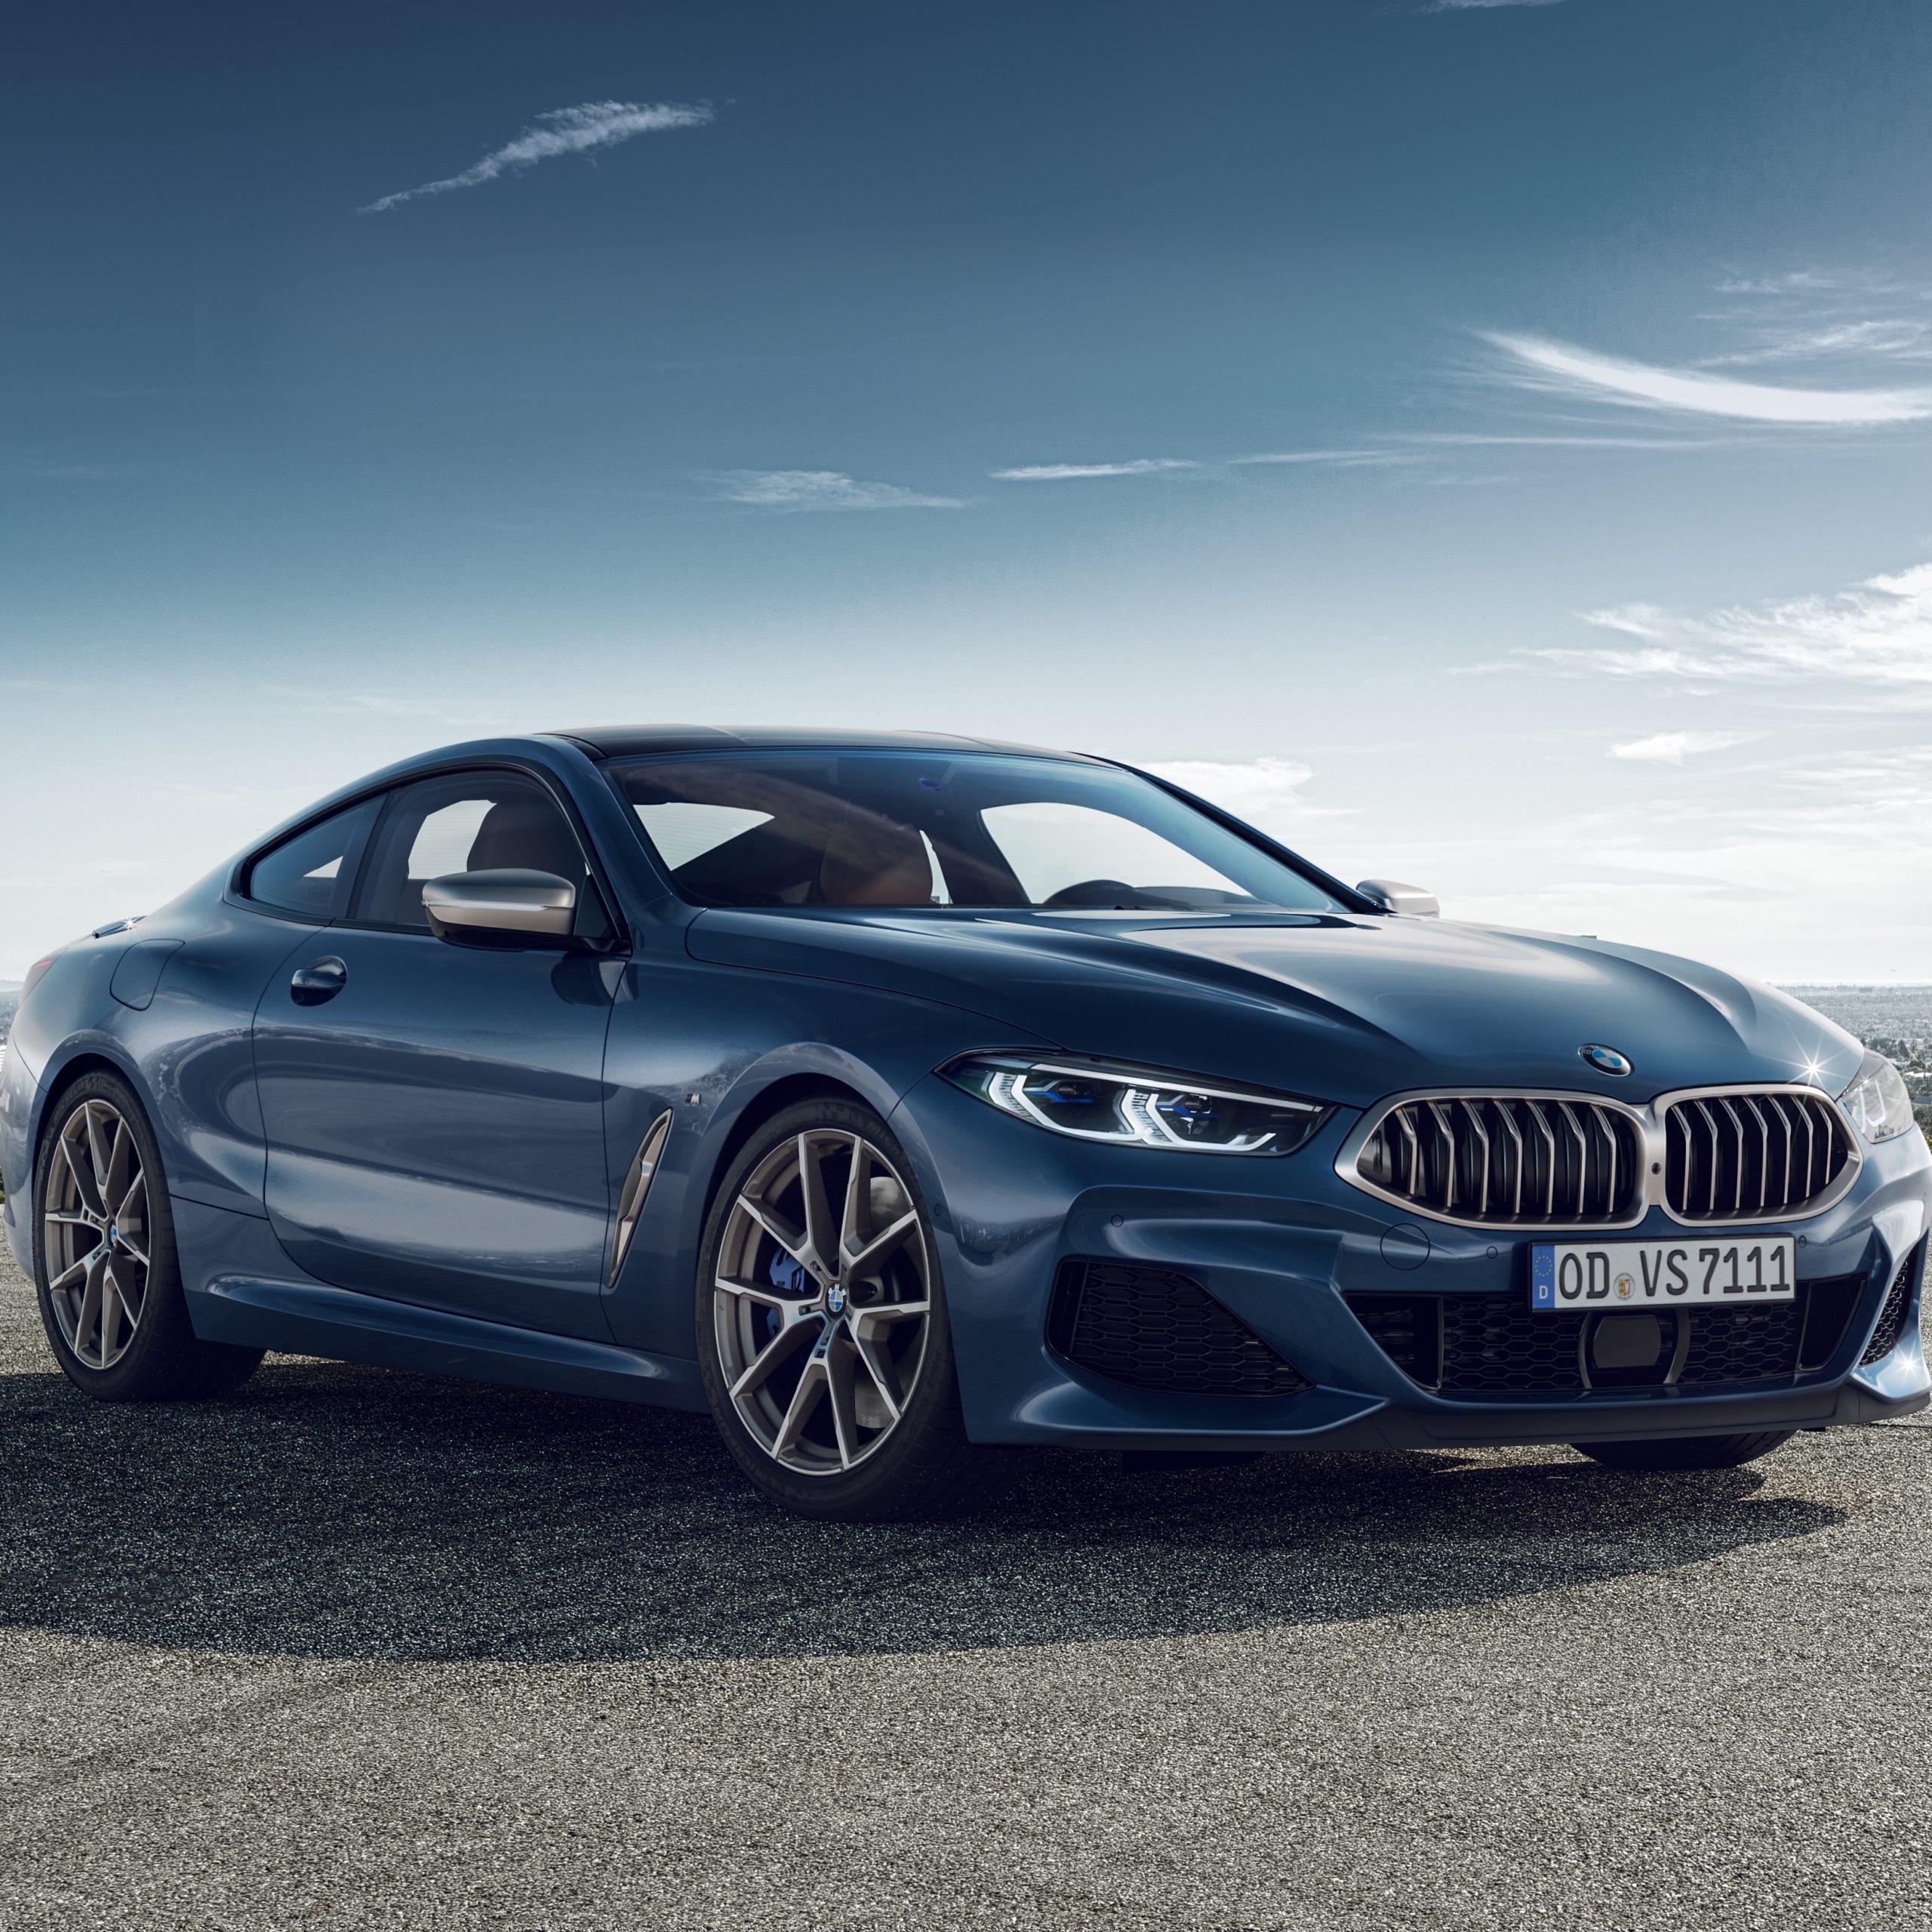 BMW 850i – Maground Backplate